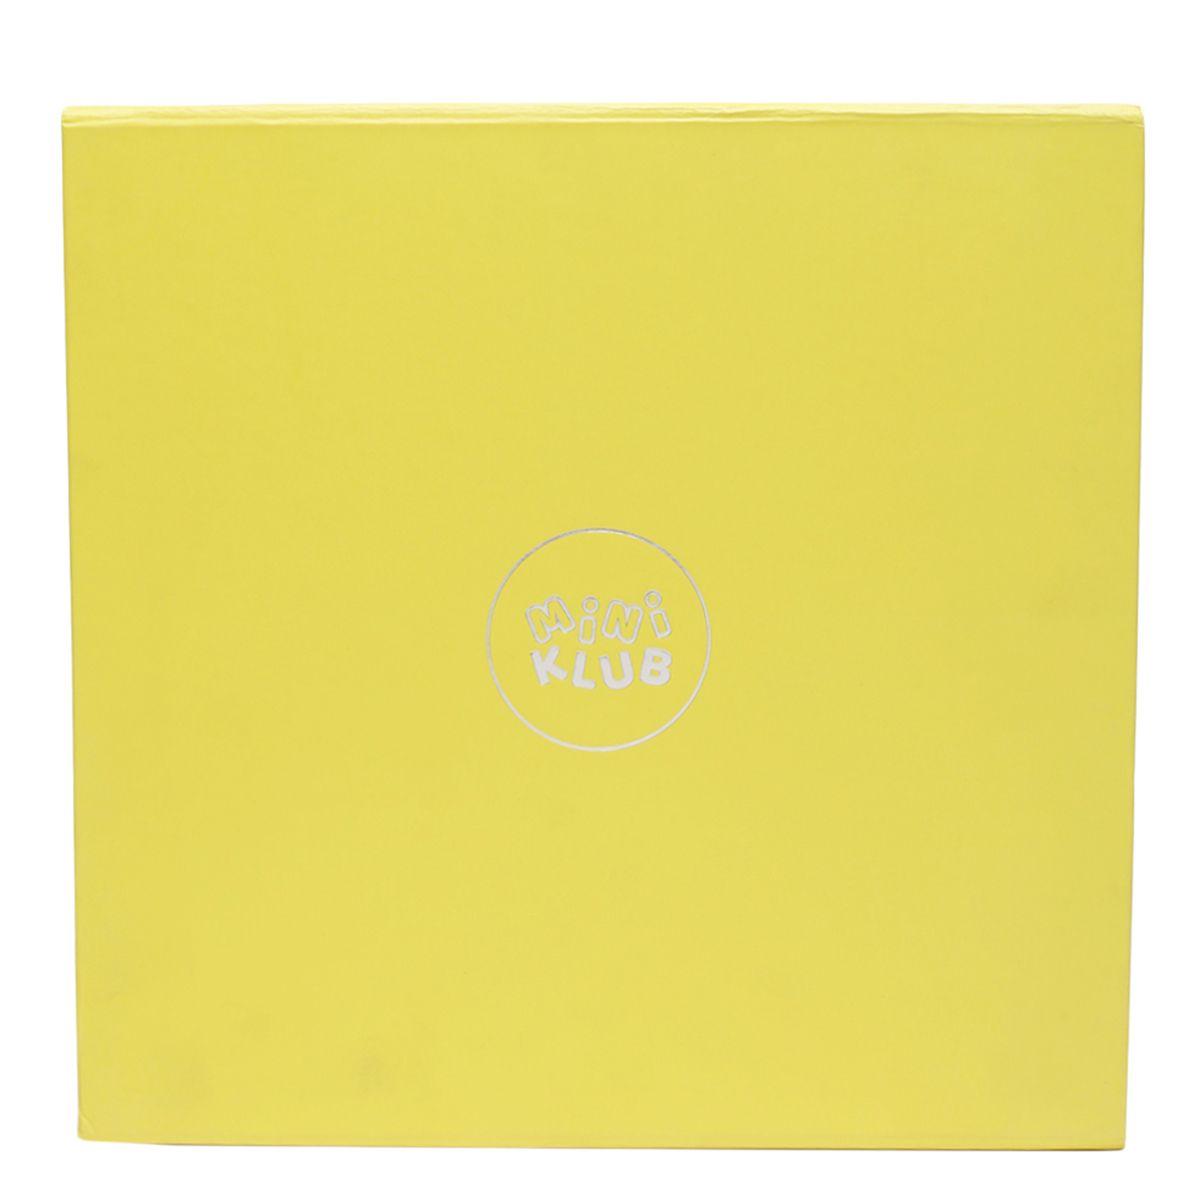 Miniklub Unisex Solid Yellow Pack of Sleepsuit, Hoodie, Photo Frame, Milestone Box & Toy